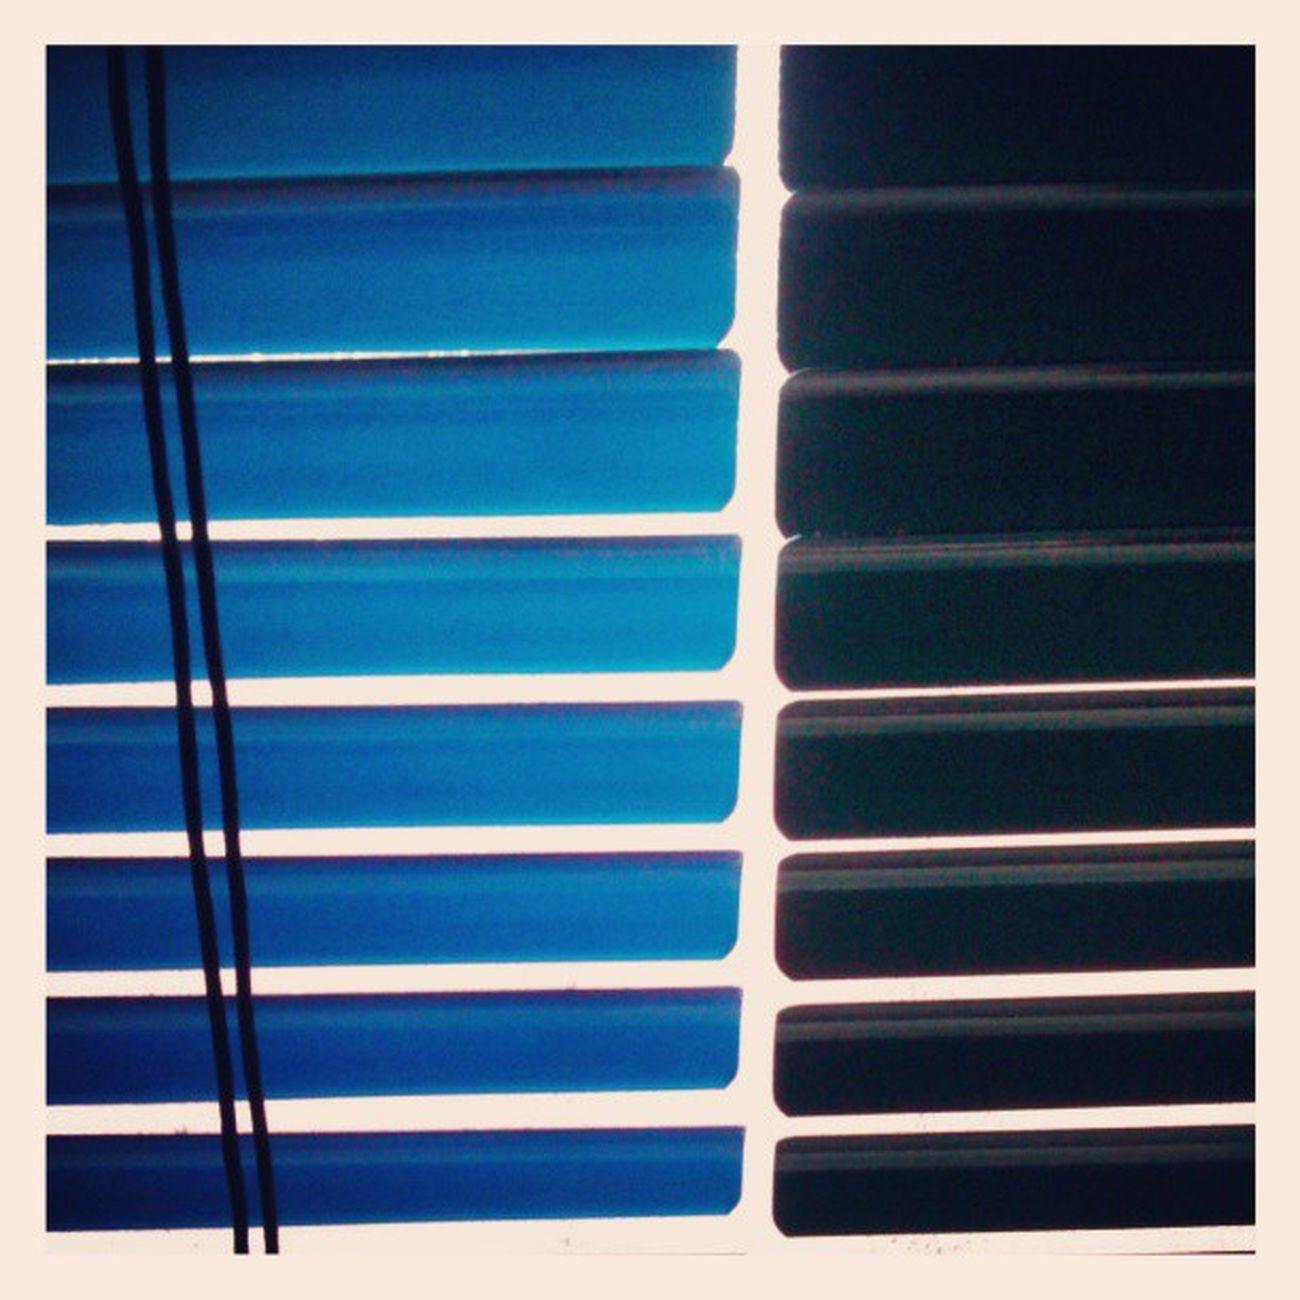 Mirillas. Fernandoluna . Fotografosvenezolanos . Cosascotidianas . Contraluz . persianas. azul. lineas. venezuela. ventana. duetono. fb